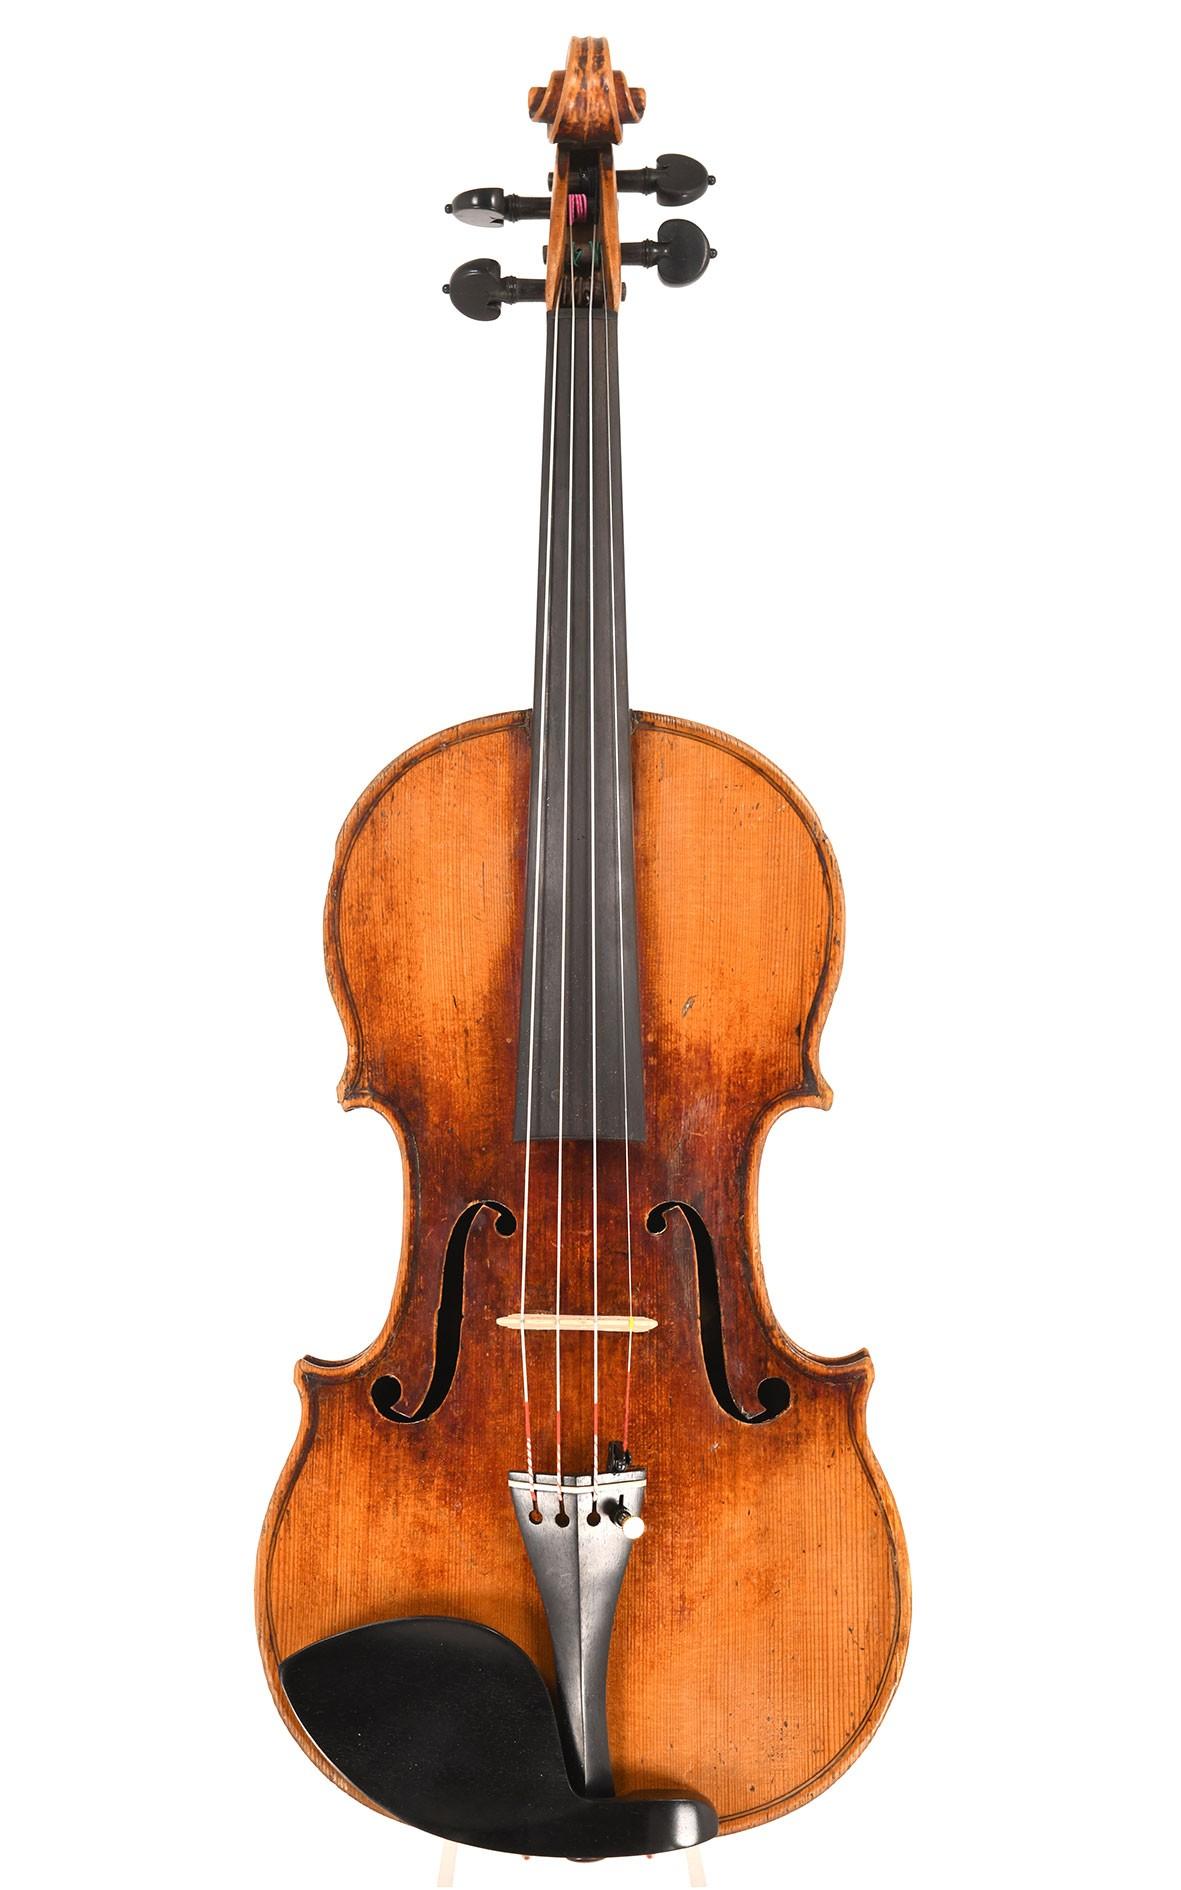 Interesting violin made by Didier Nicolas in Mirecourt around 1810